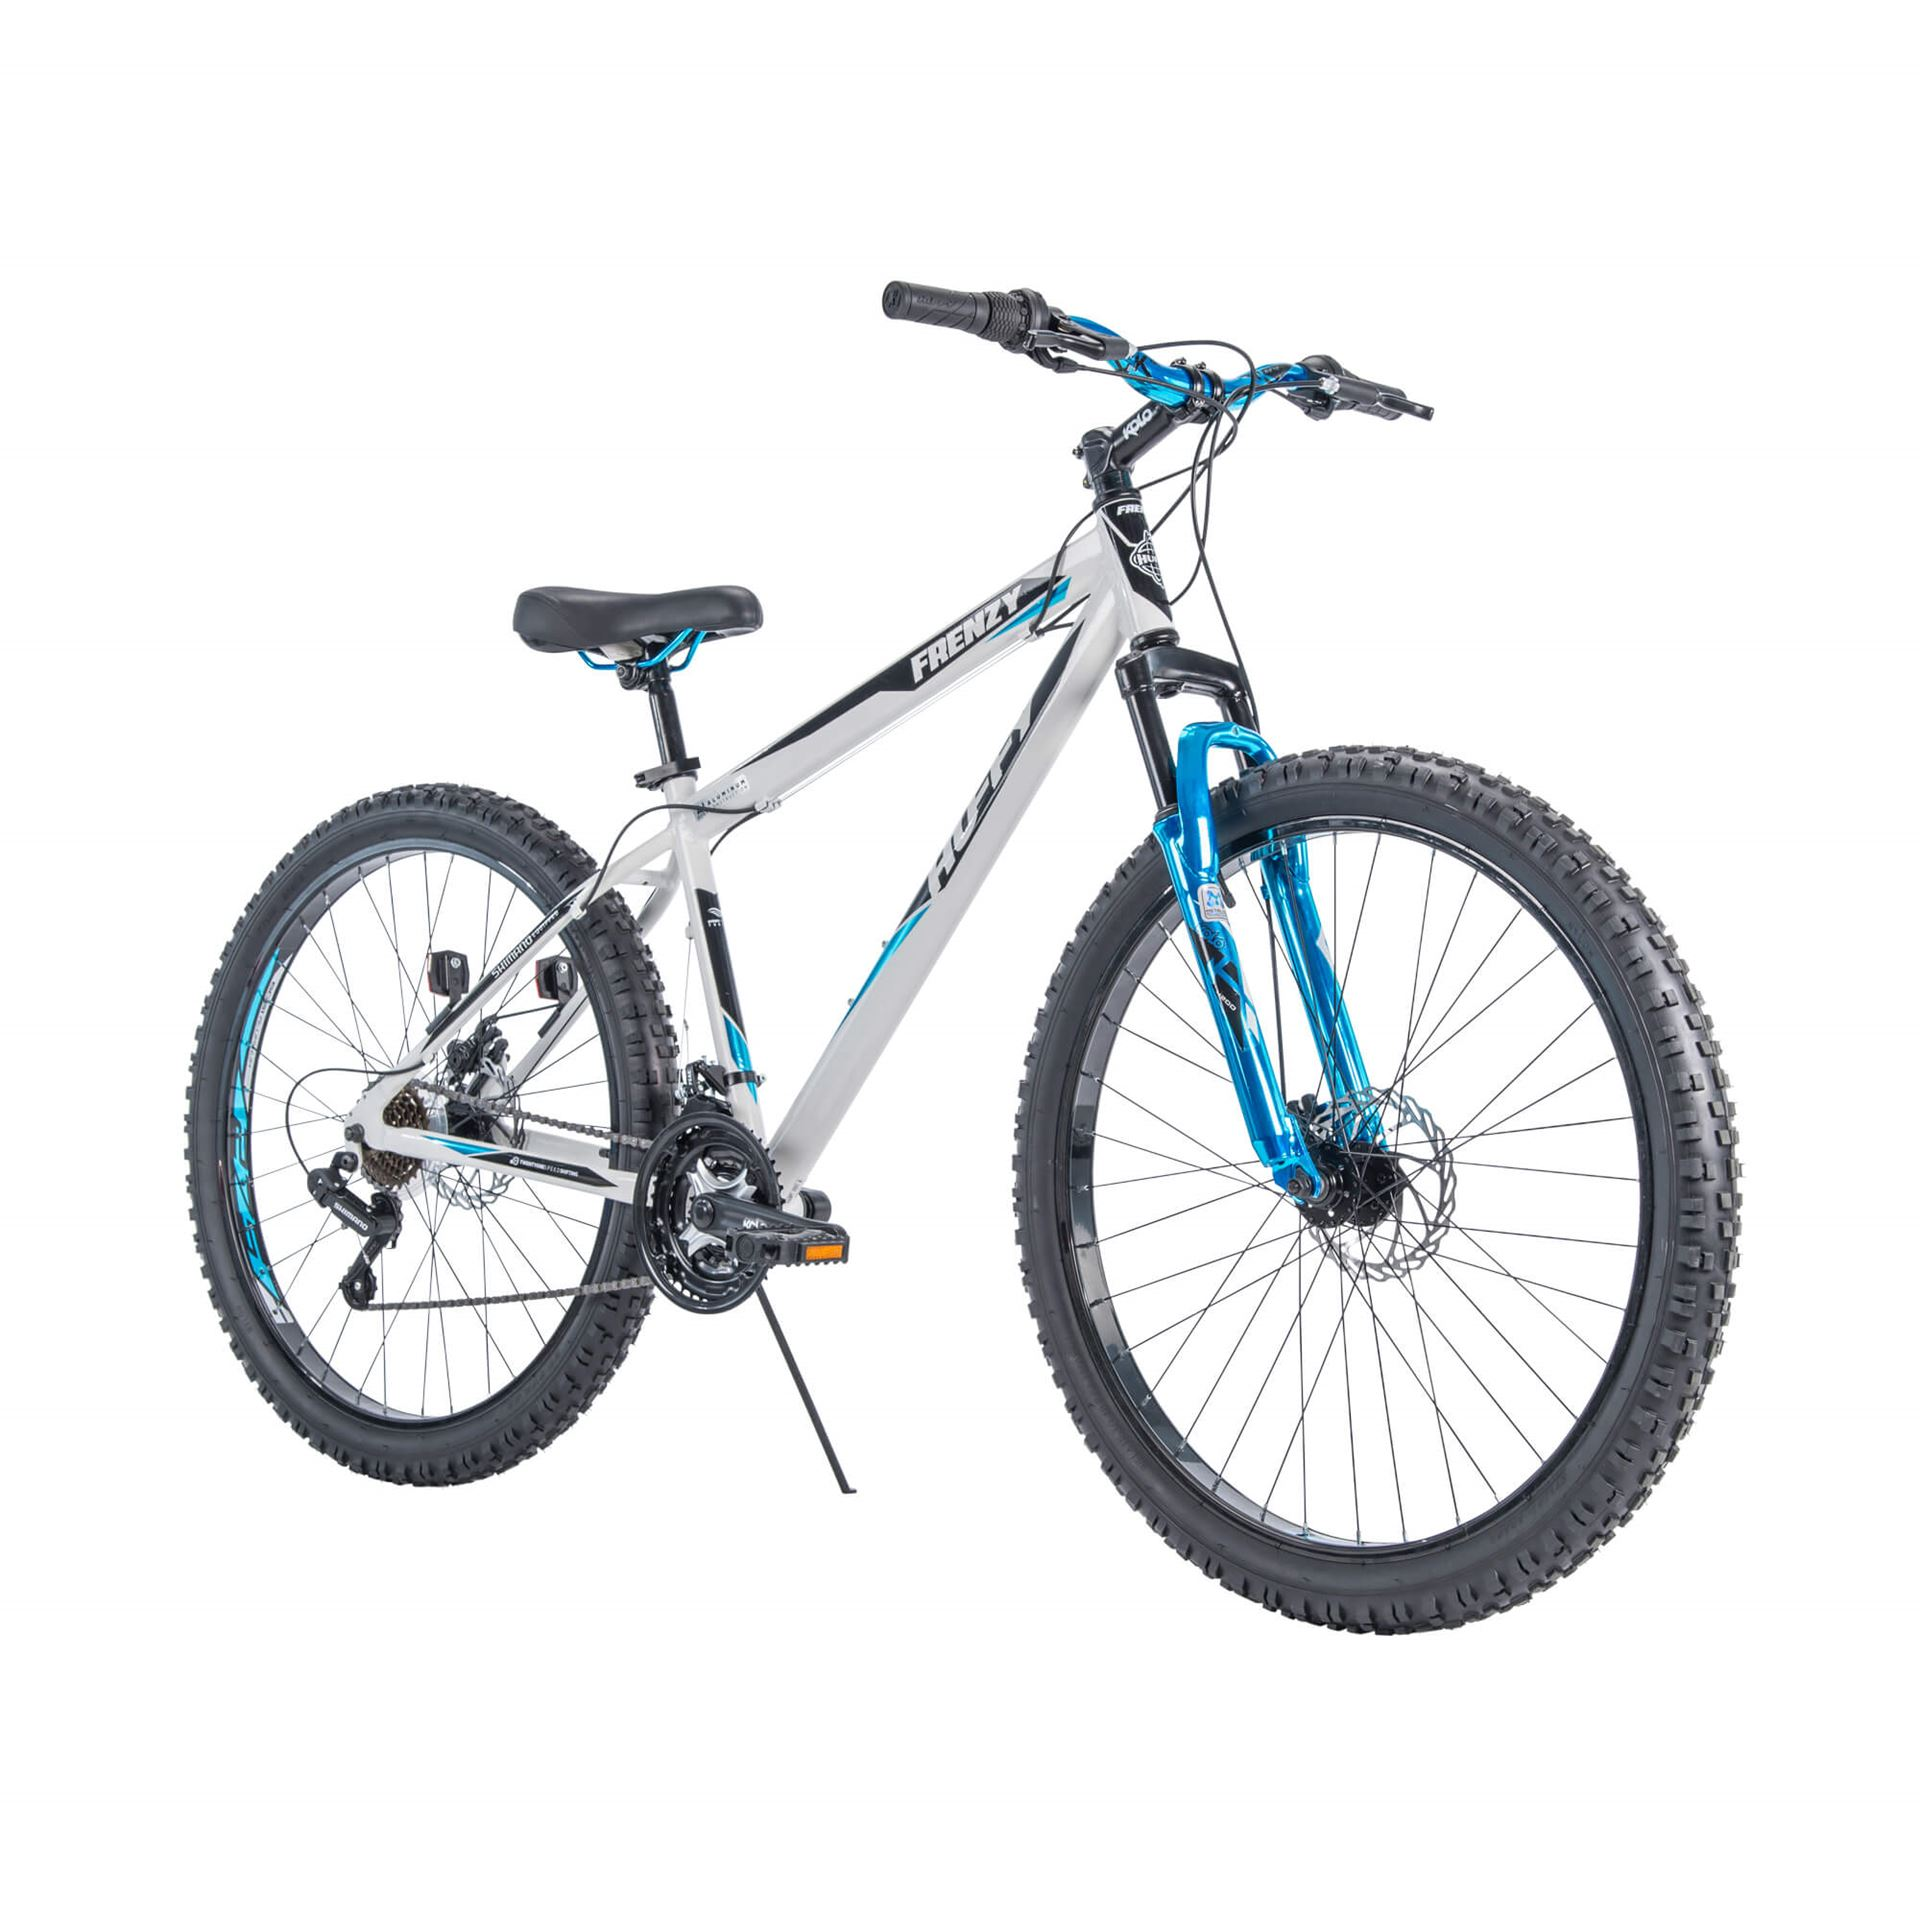 "Huffy 27.5"" Frenzy Mens Mountain Bike with Aluminum Frame, Blue"